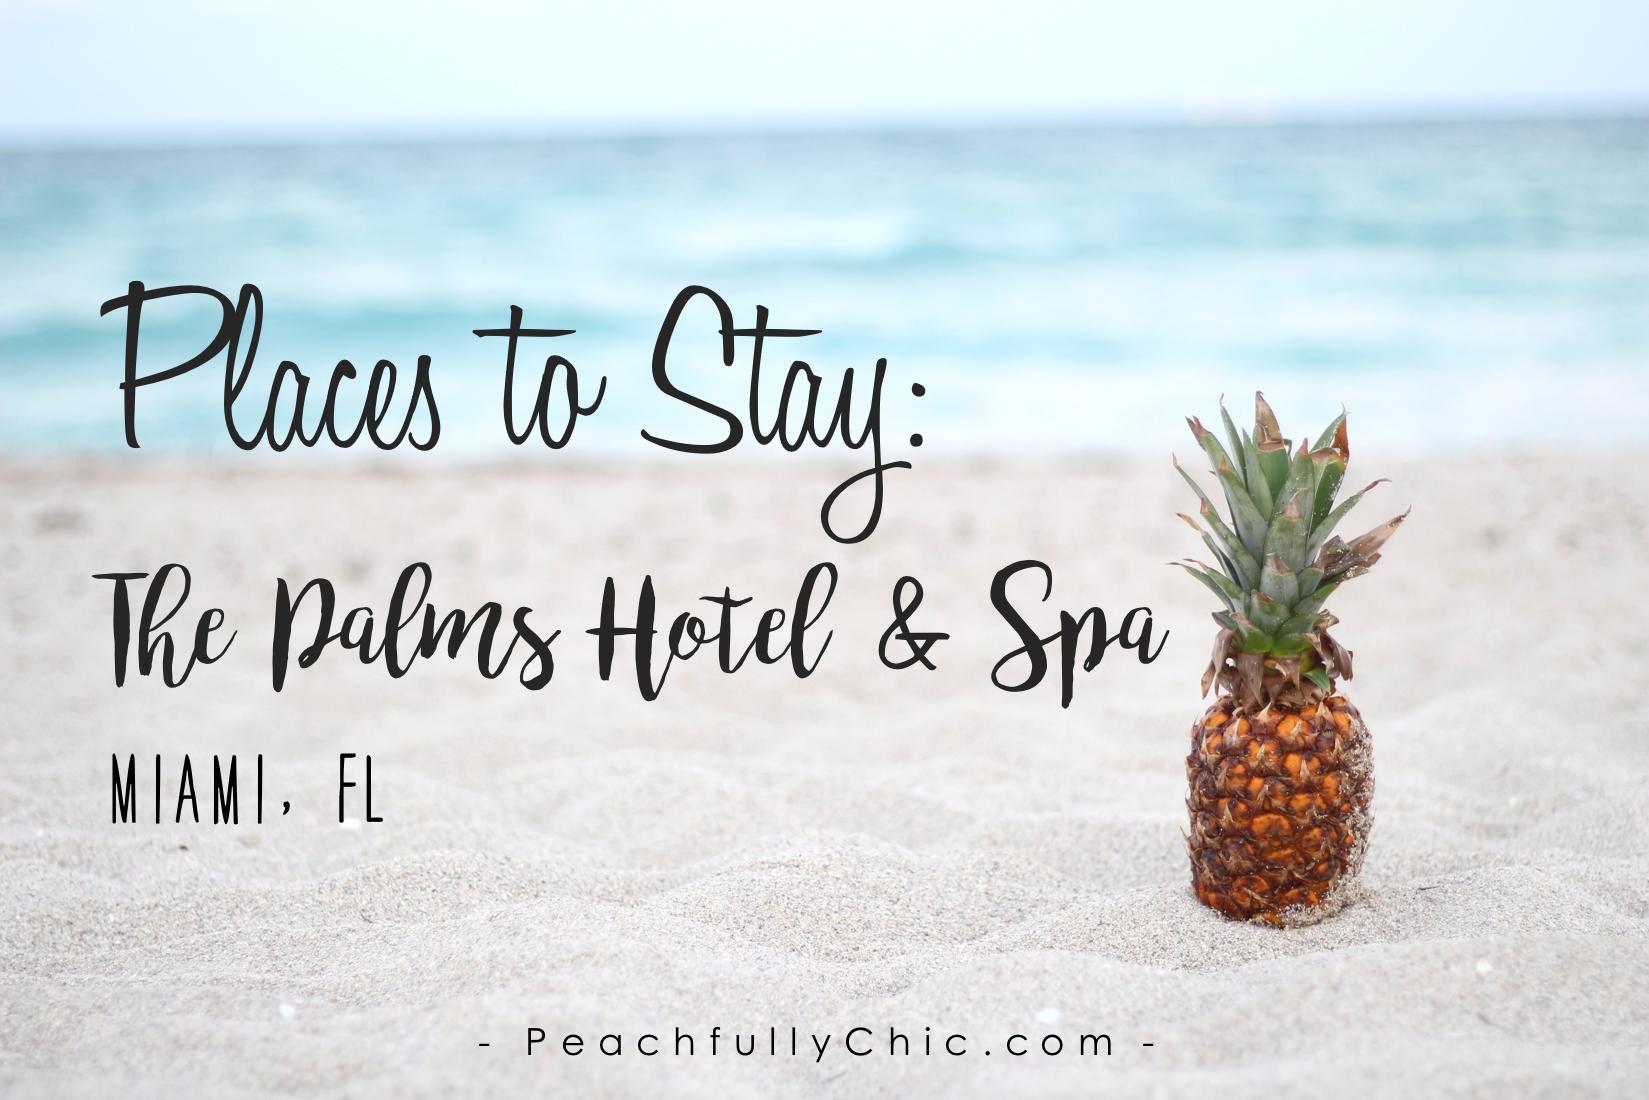 Palms-Hotel-&-Spa-Miami-Beach-Review-main